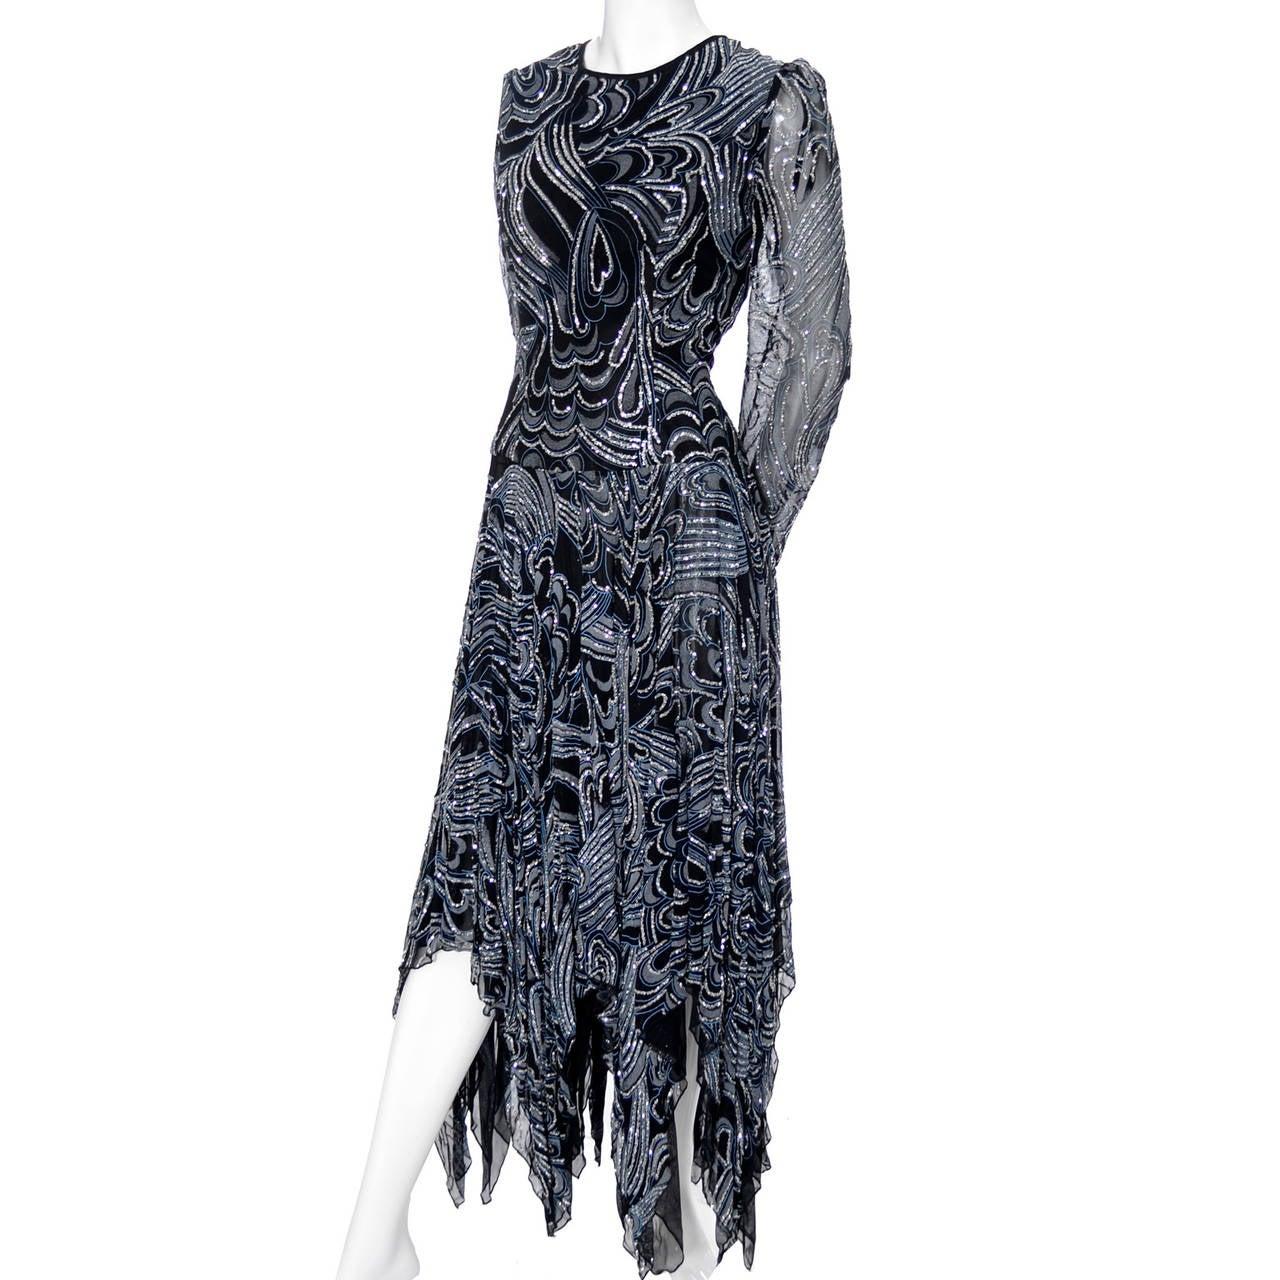 Women's 1980s Terence Nolder Vintage Dress w Handkerchief Hem in Metallic Sparkle Fabric For Sale